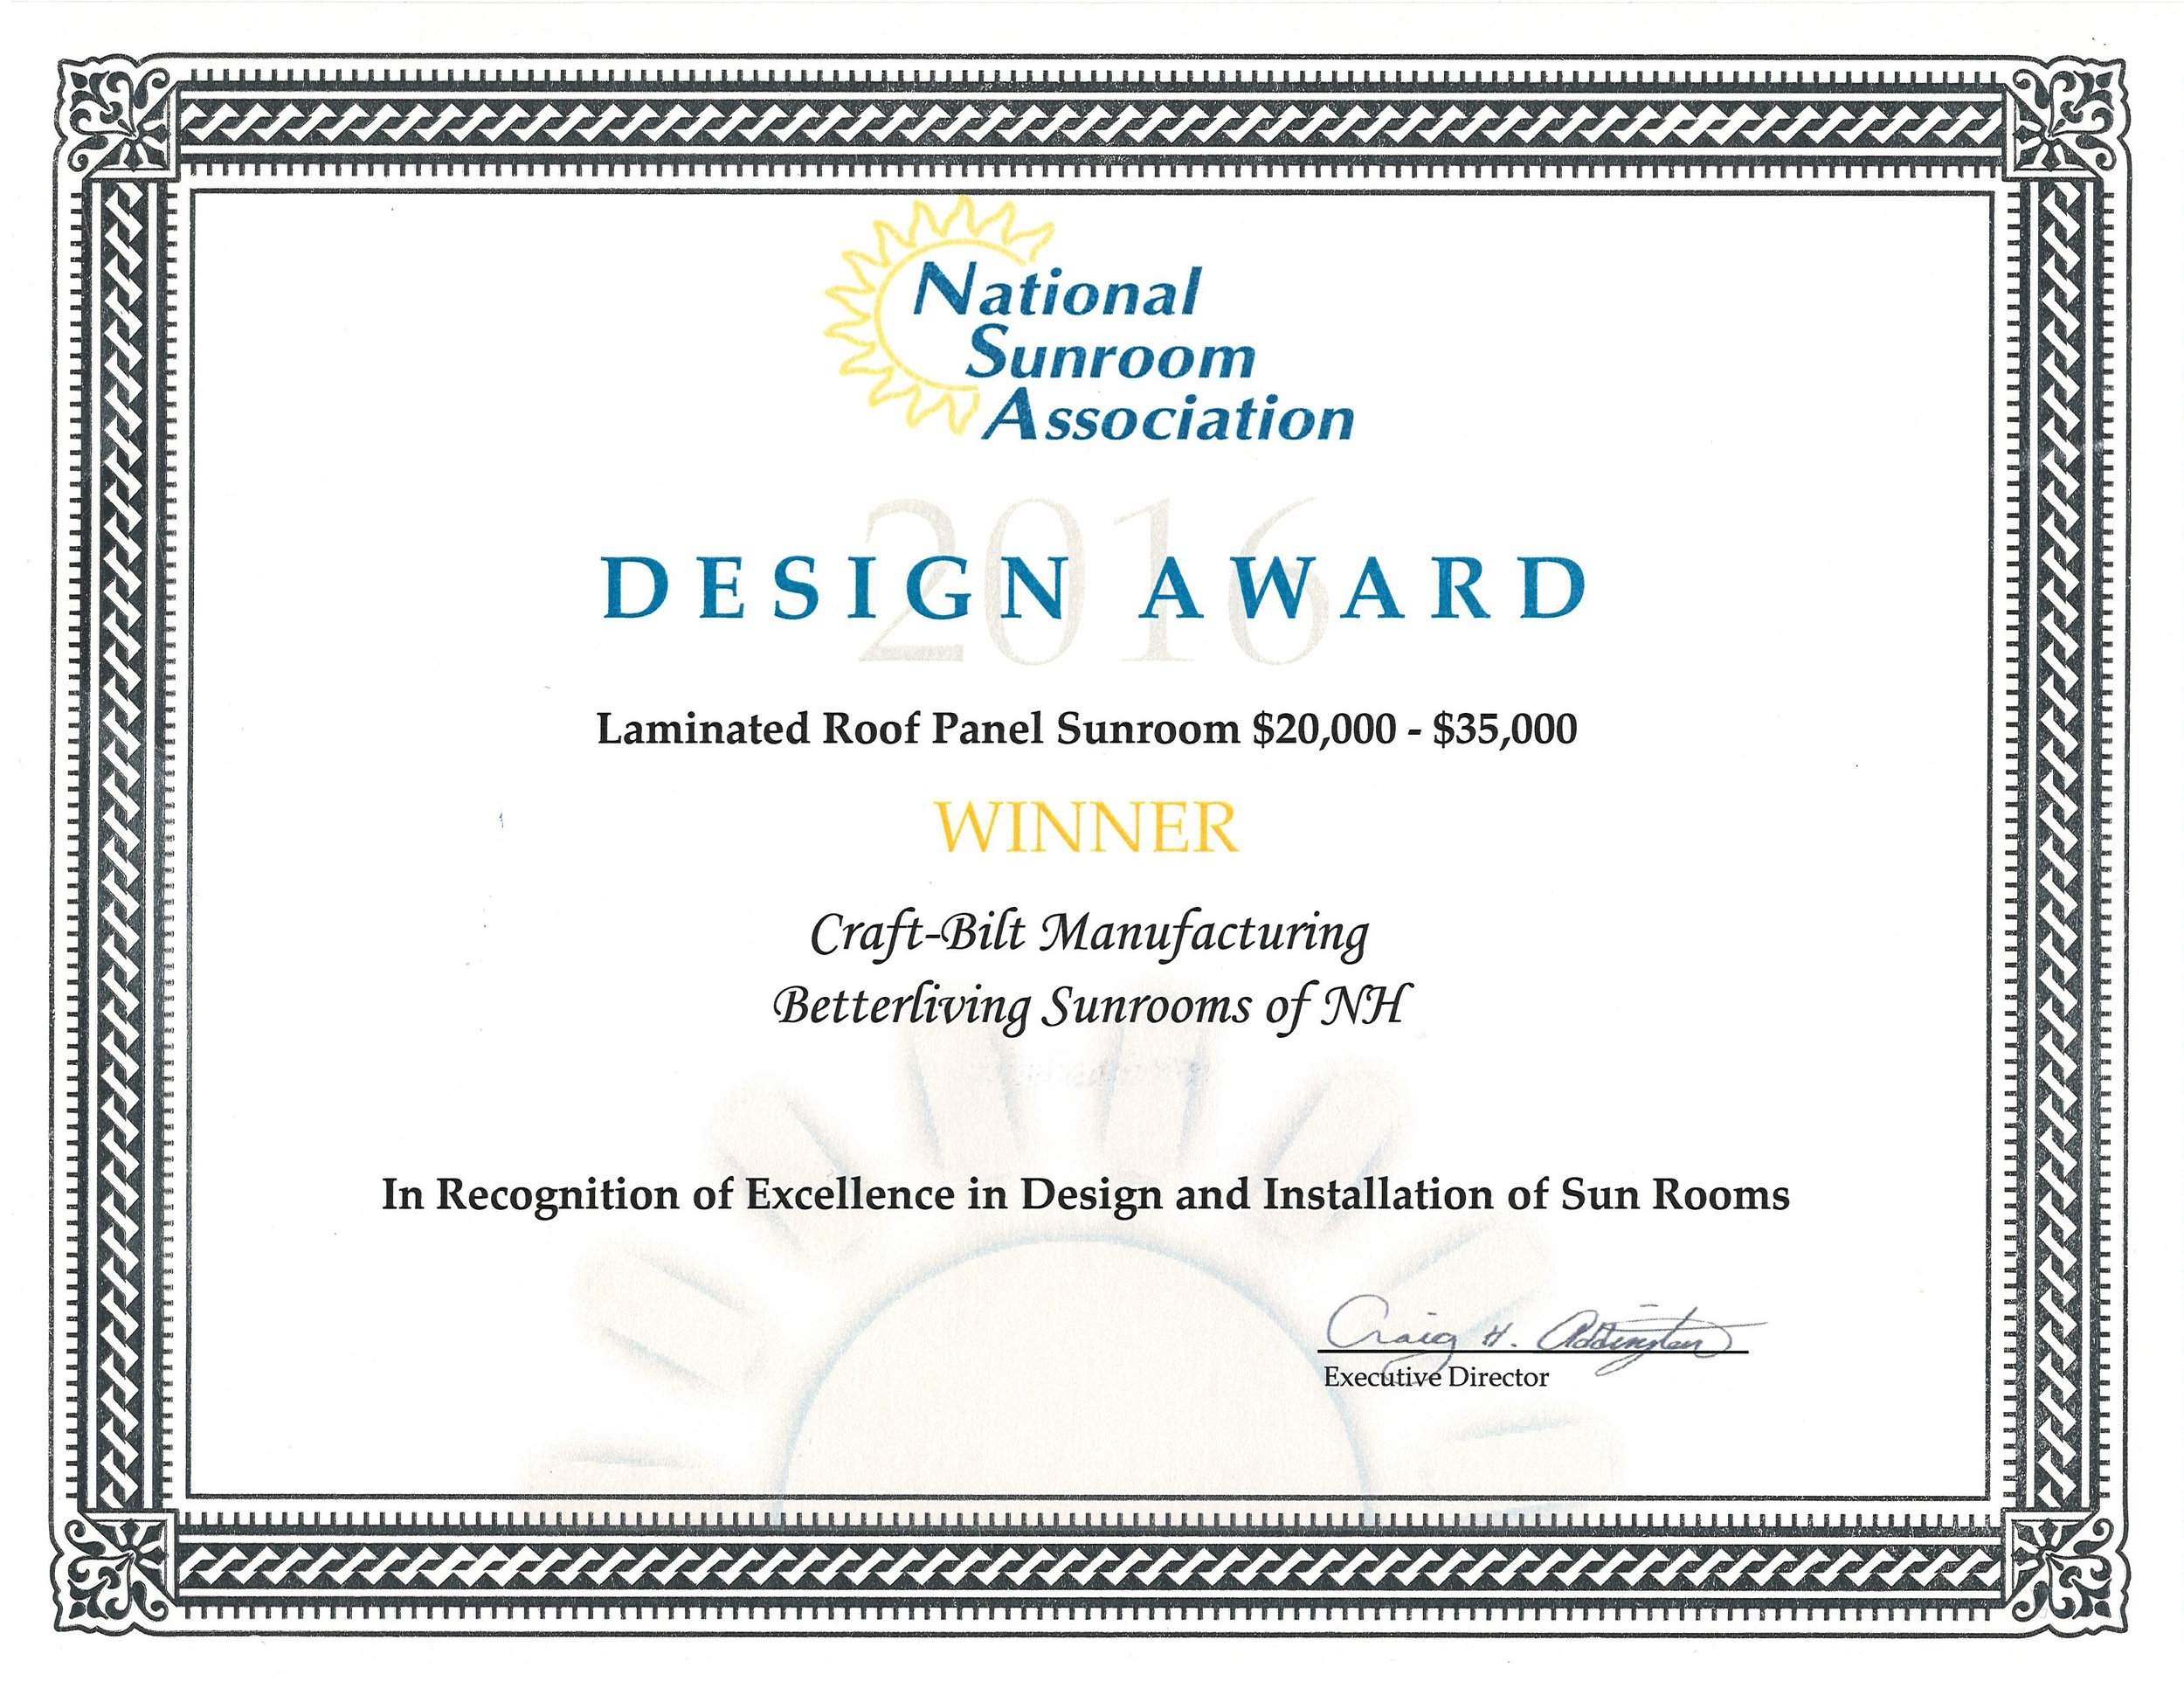 Another Sunroom Design Award